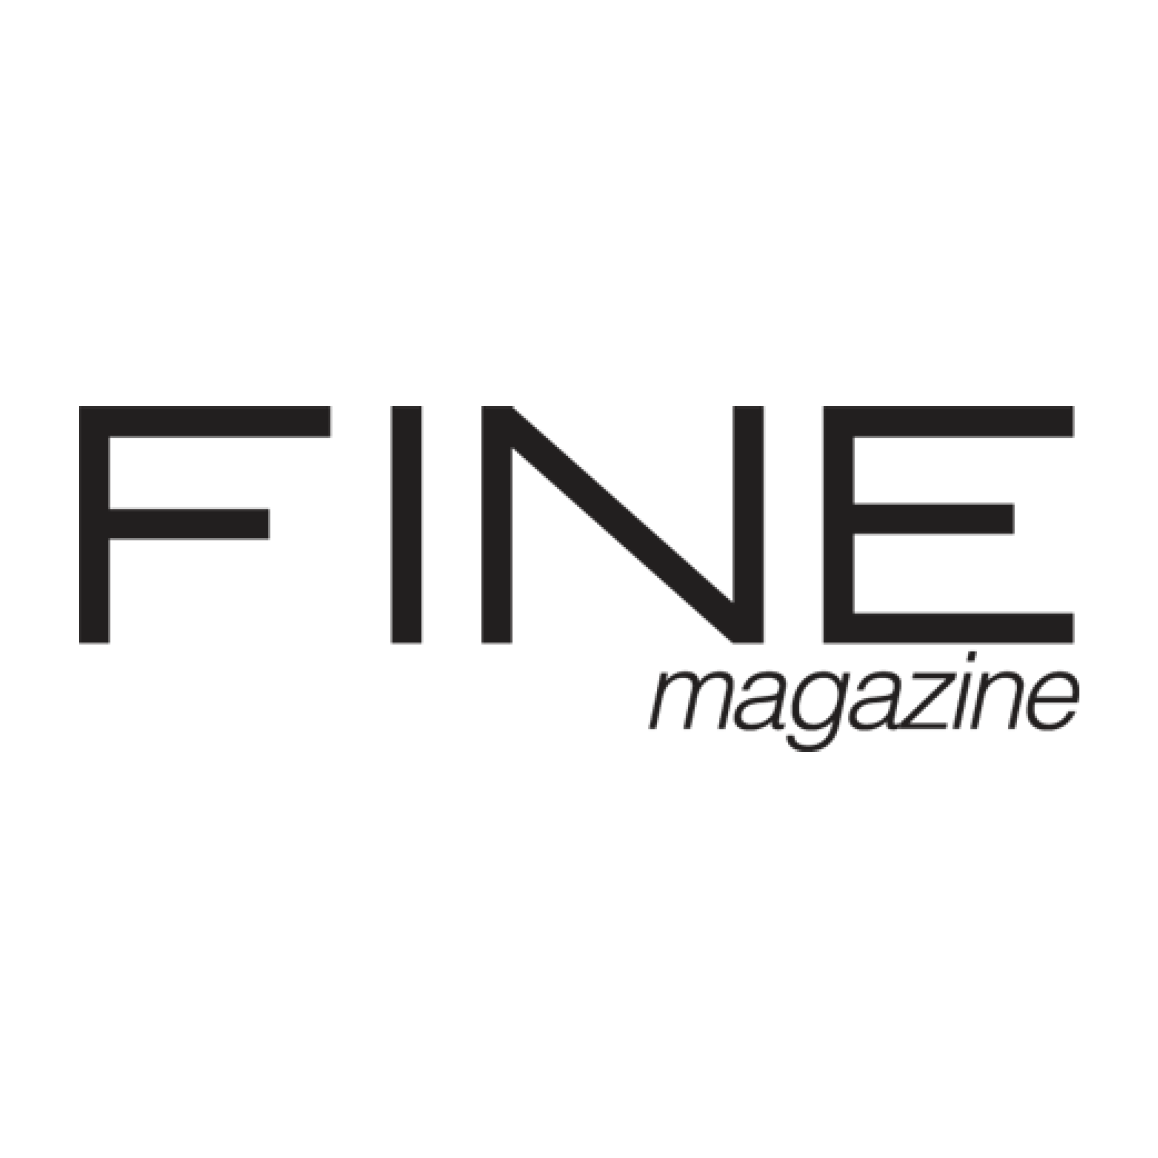 fine magazine.png